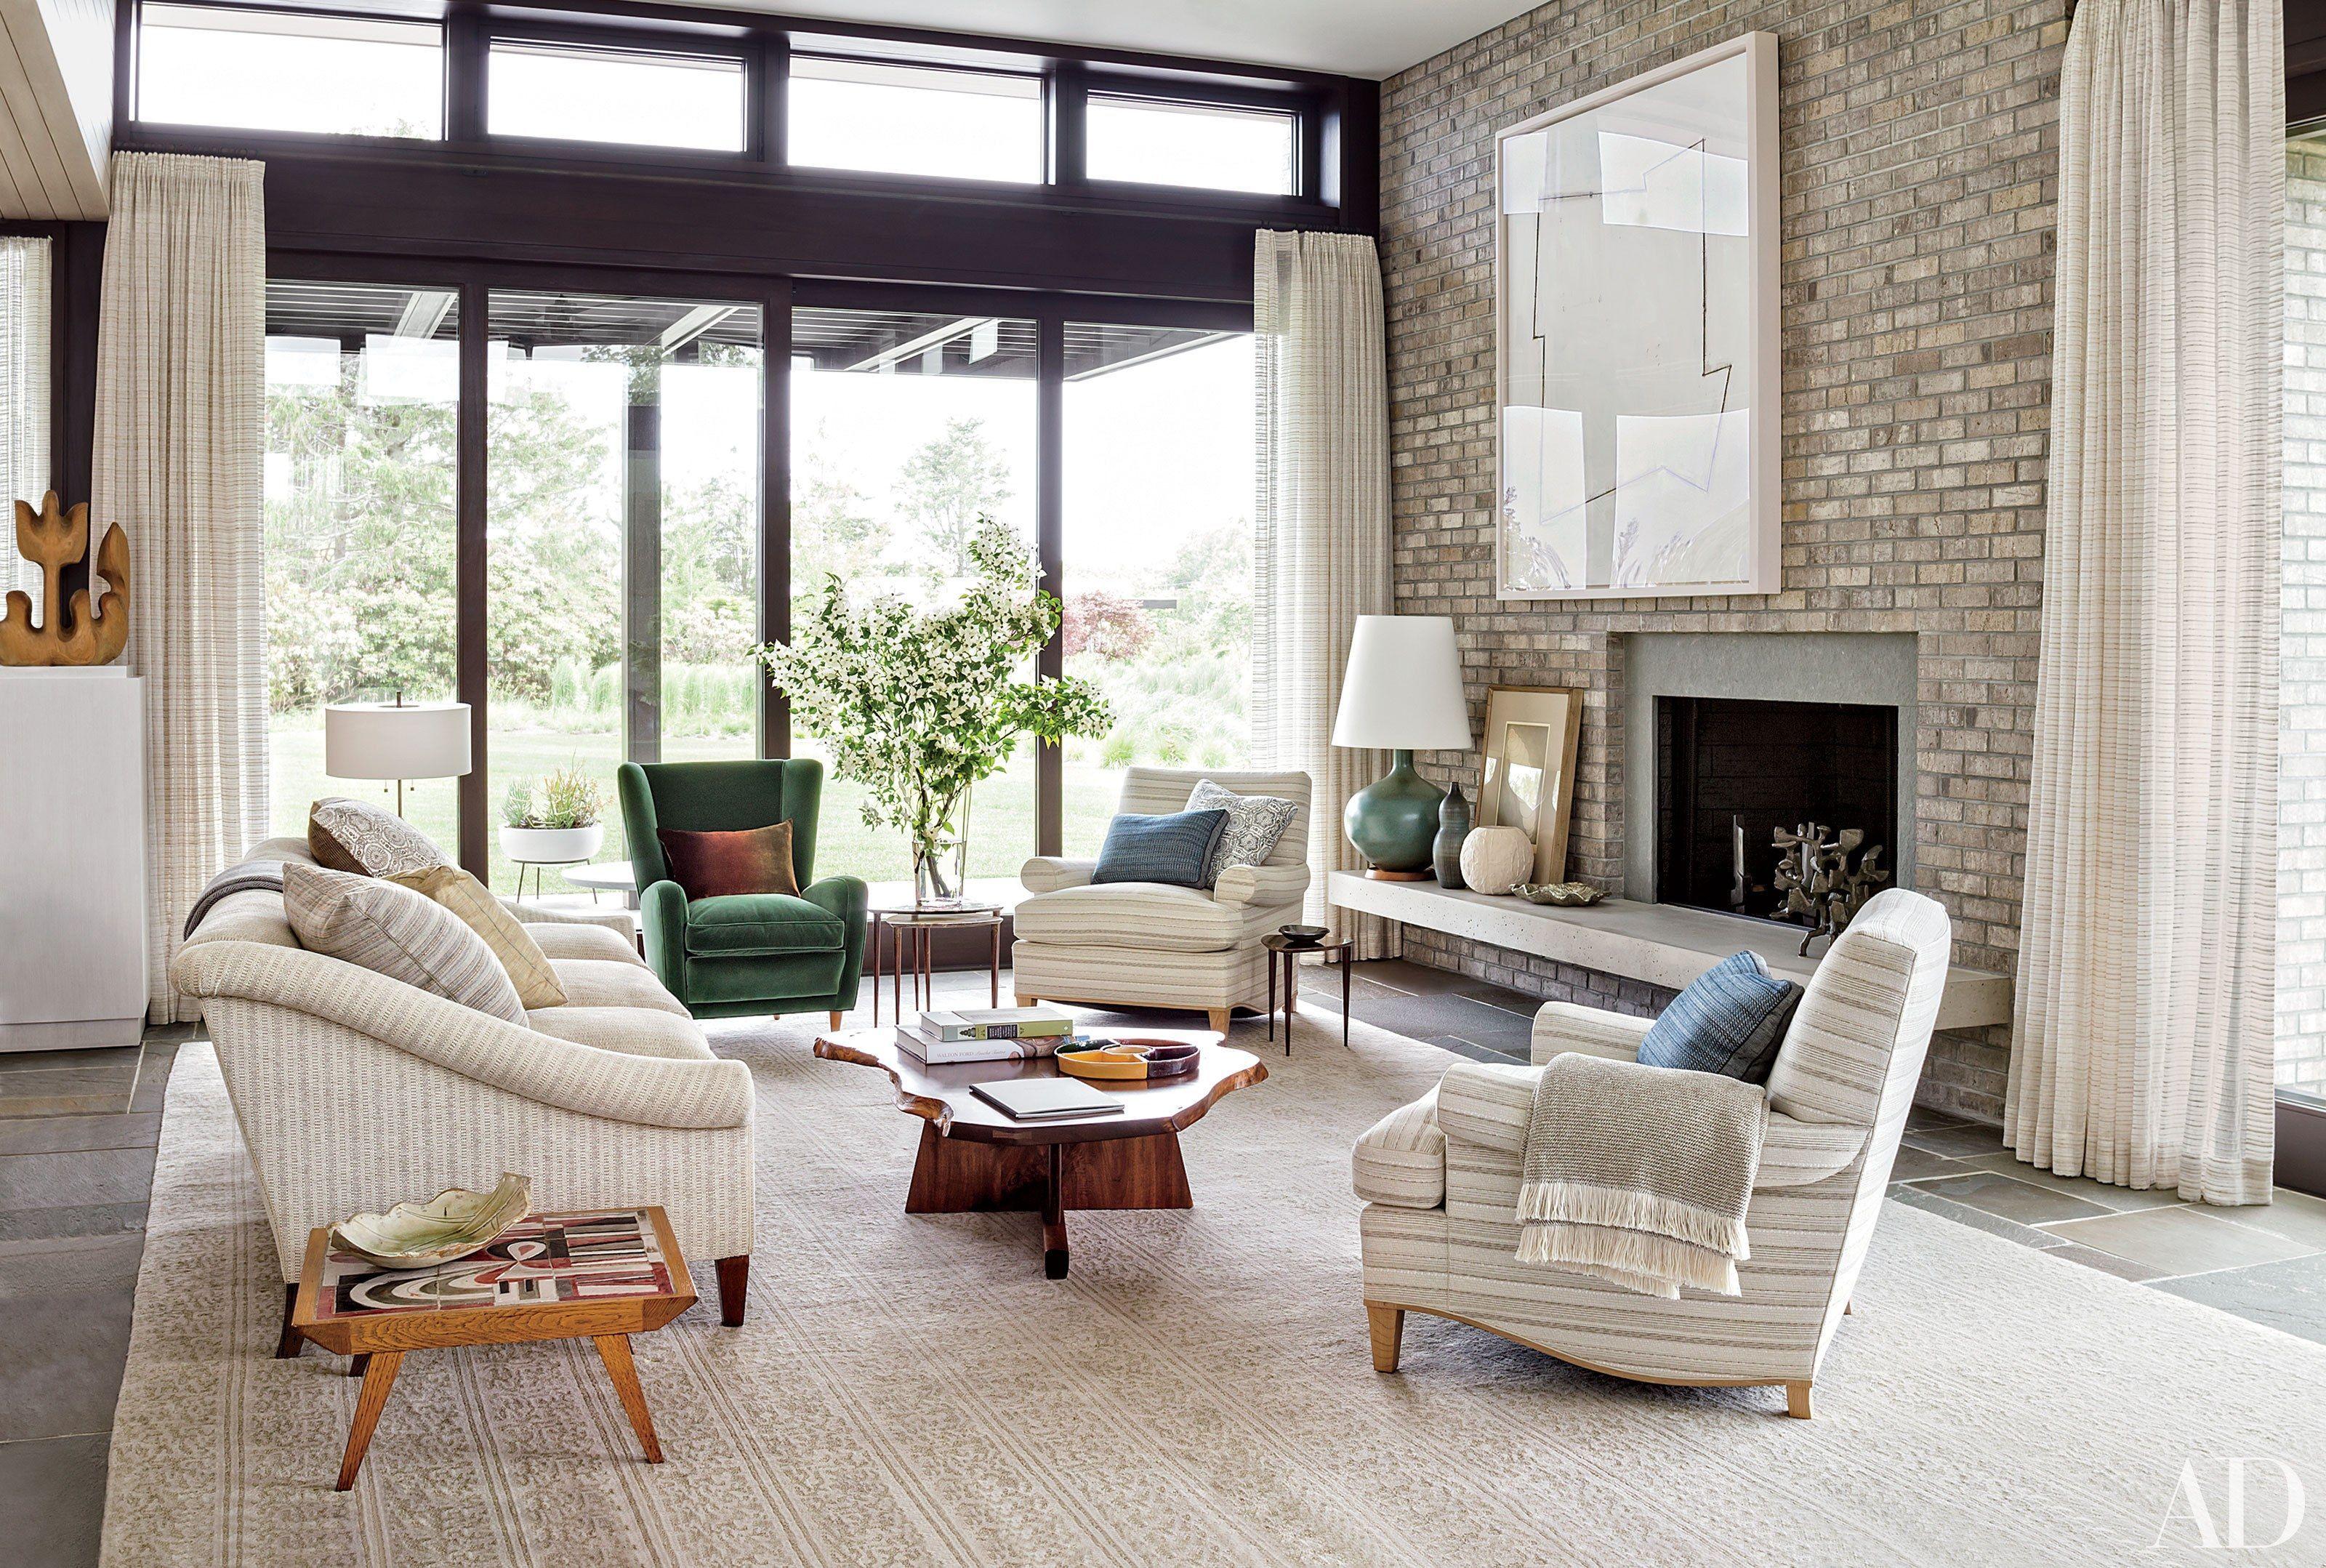 Interior Design Firm Names Ideas Design Names Ideas In 2020 Decor Interior Design Top Interior Design Firms Decor Design